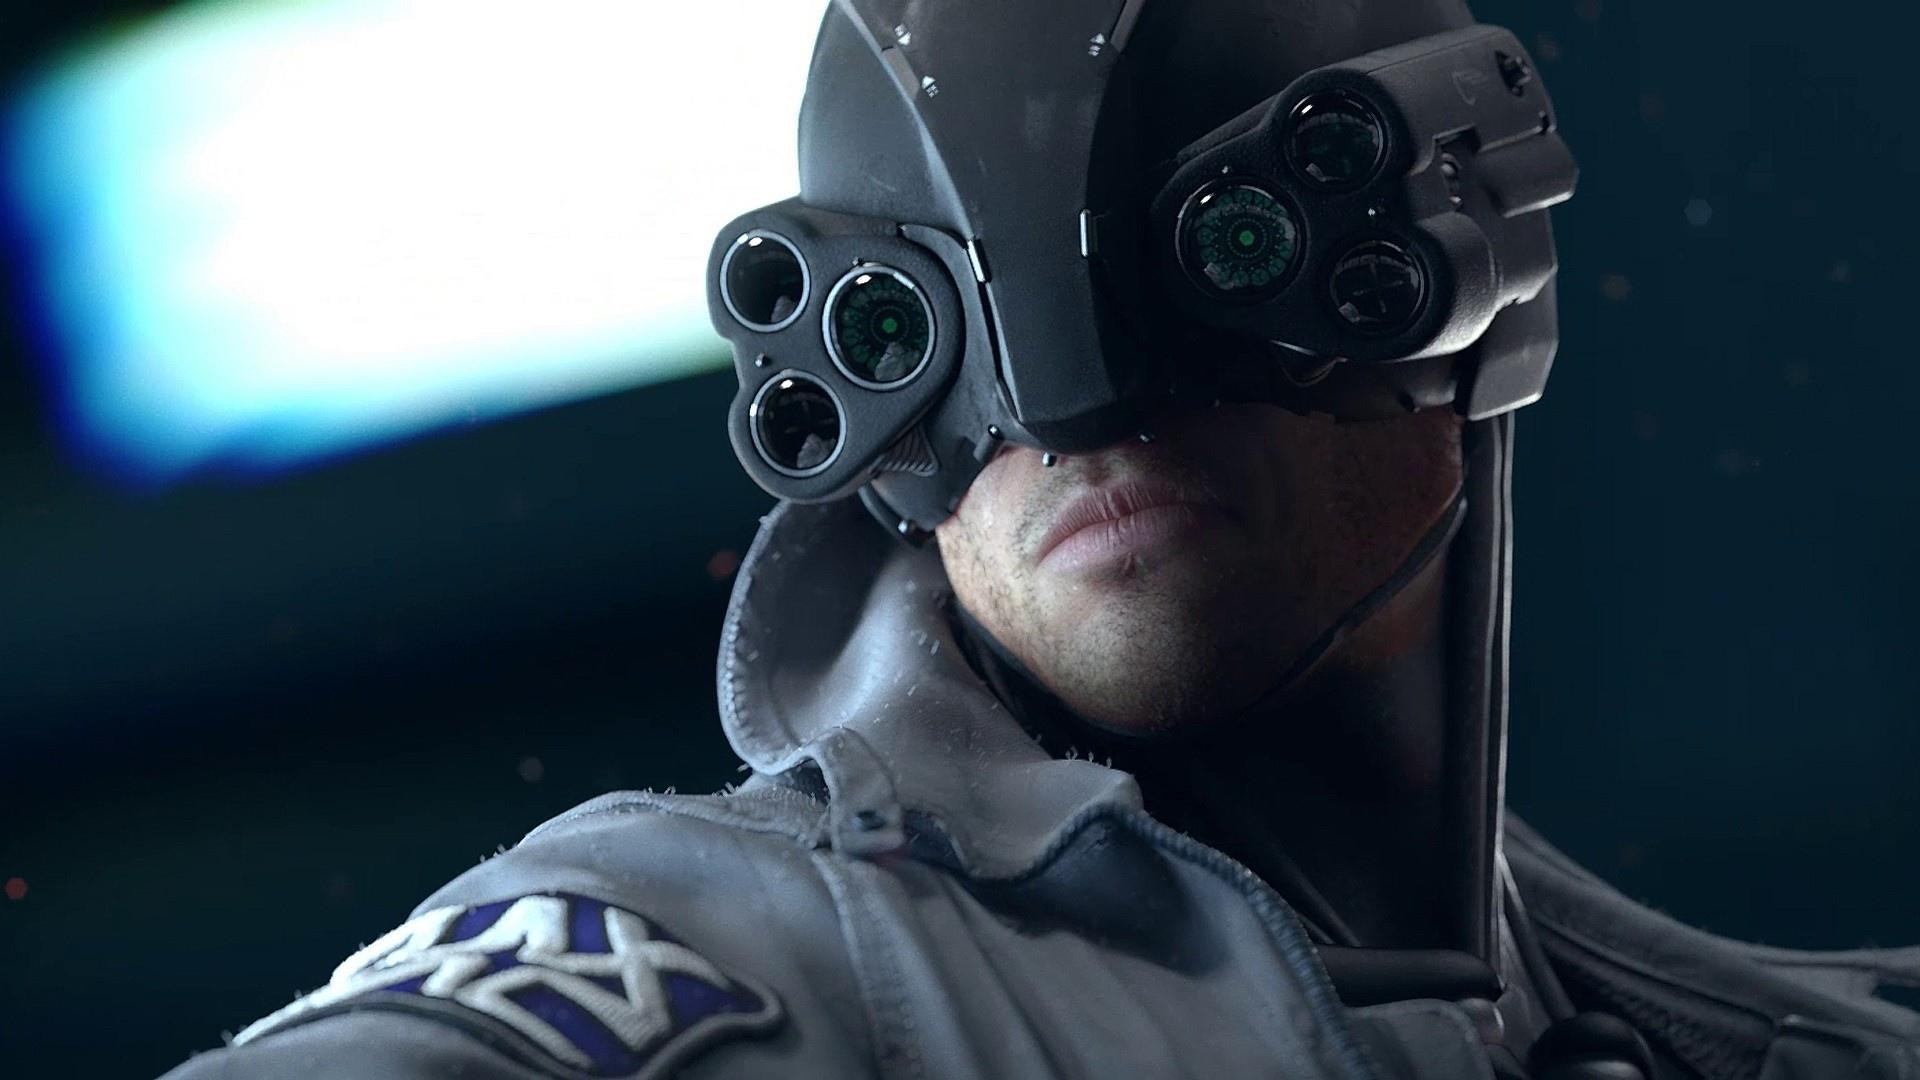 Cyberpunk 2077 Wallpaper HD Download